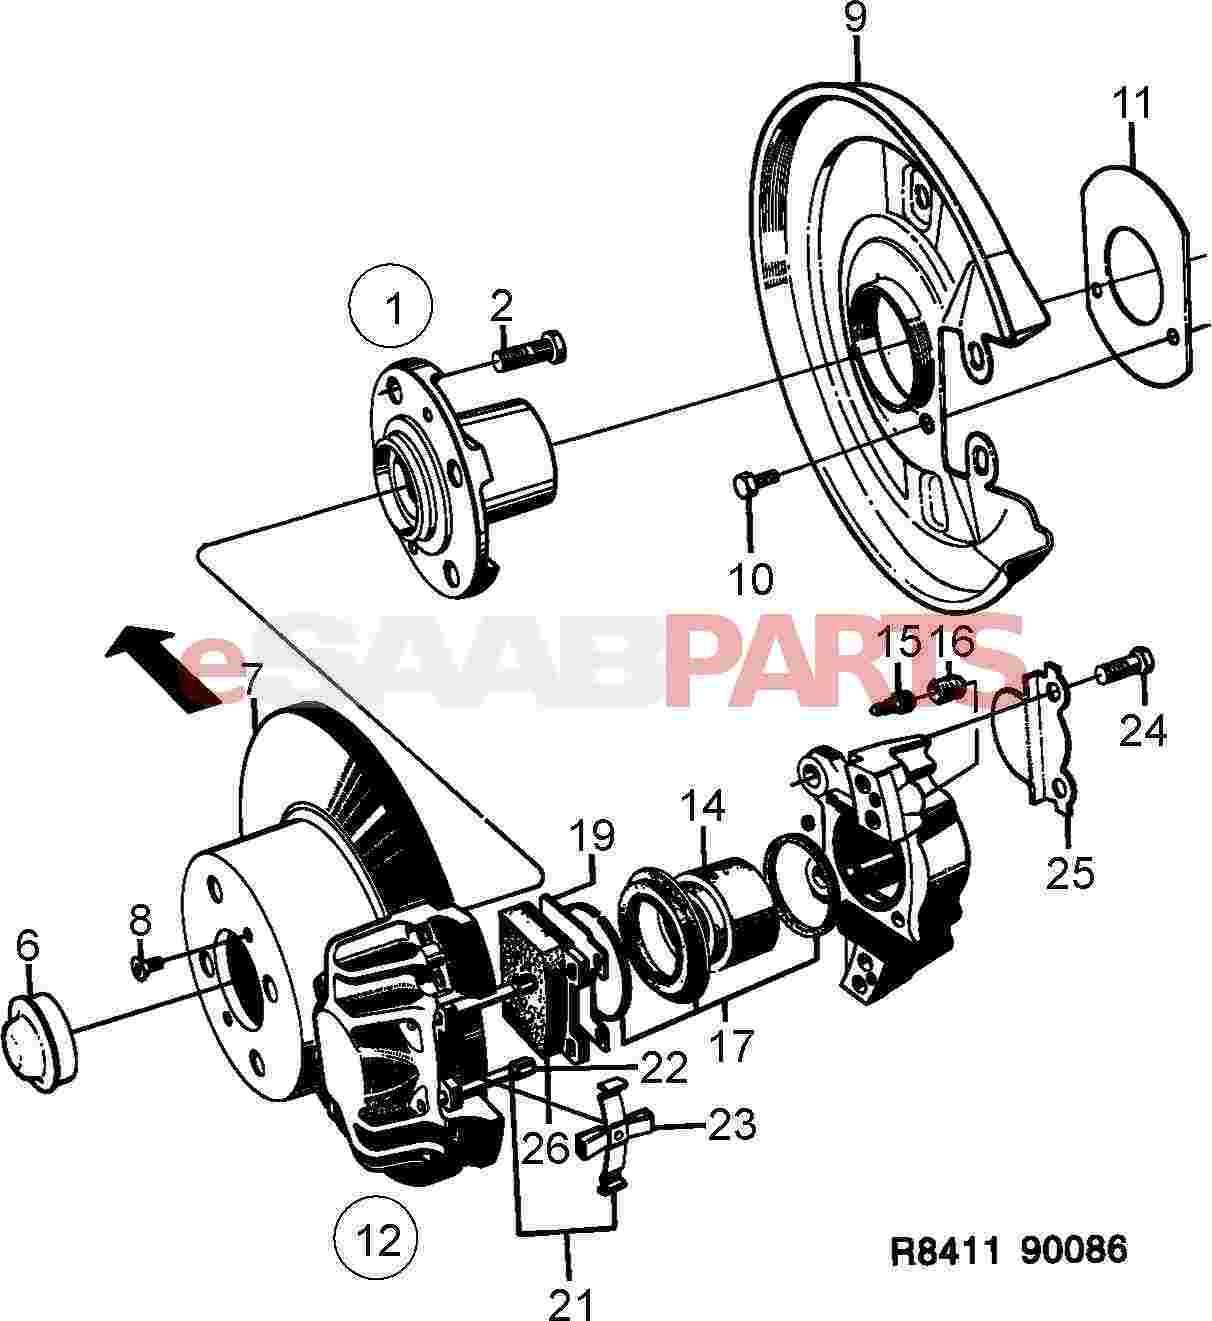 Showthread php besides Ford 4 6l 3v Engine moreover 241152 Cadillac 3 6l Timing Chain further Saab Brake Caliper Diagram likewise 2 0 4 Cyl Chrysler Firing Order. on saab 9 3 v6 engine diagram